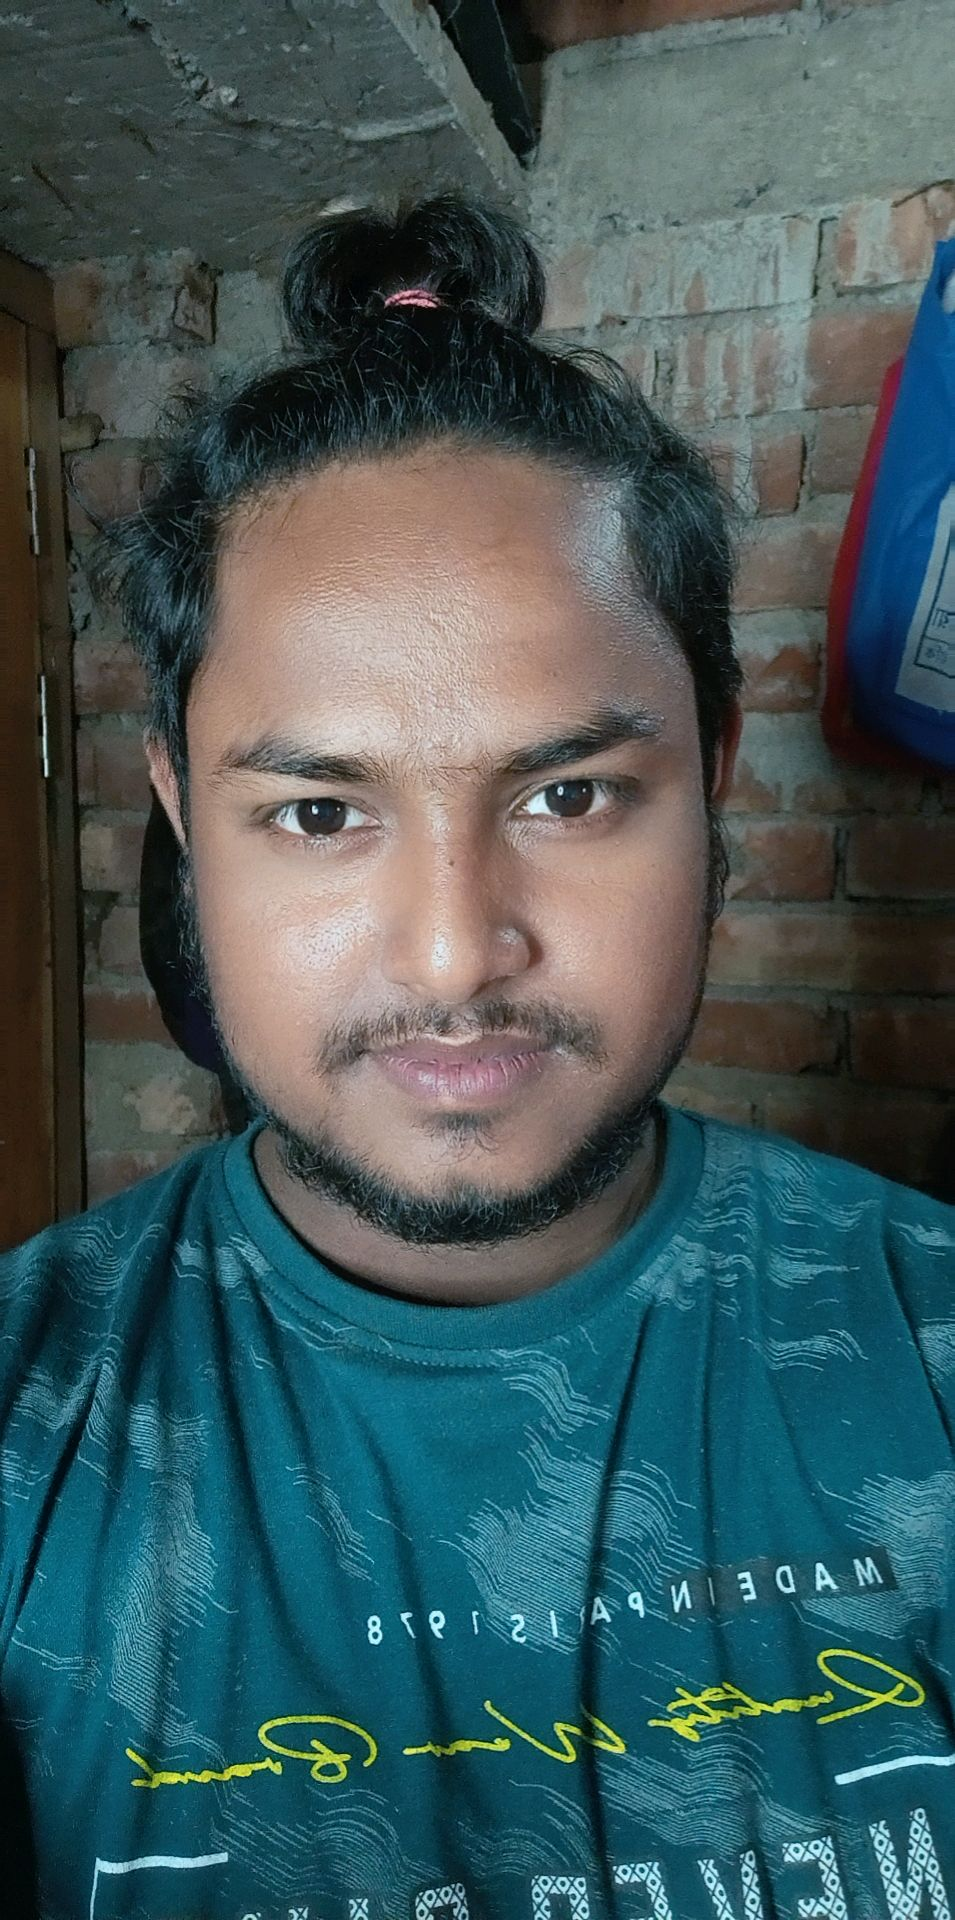 Uploaded by @Ajaruddin